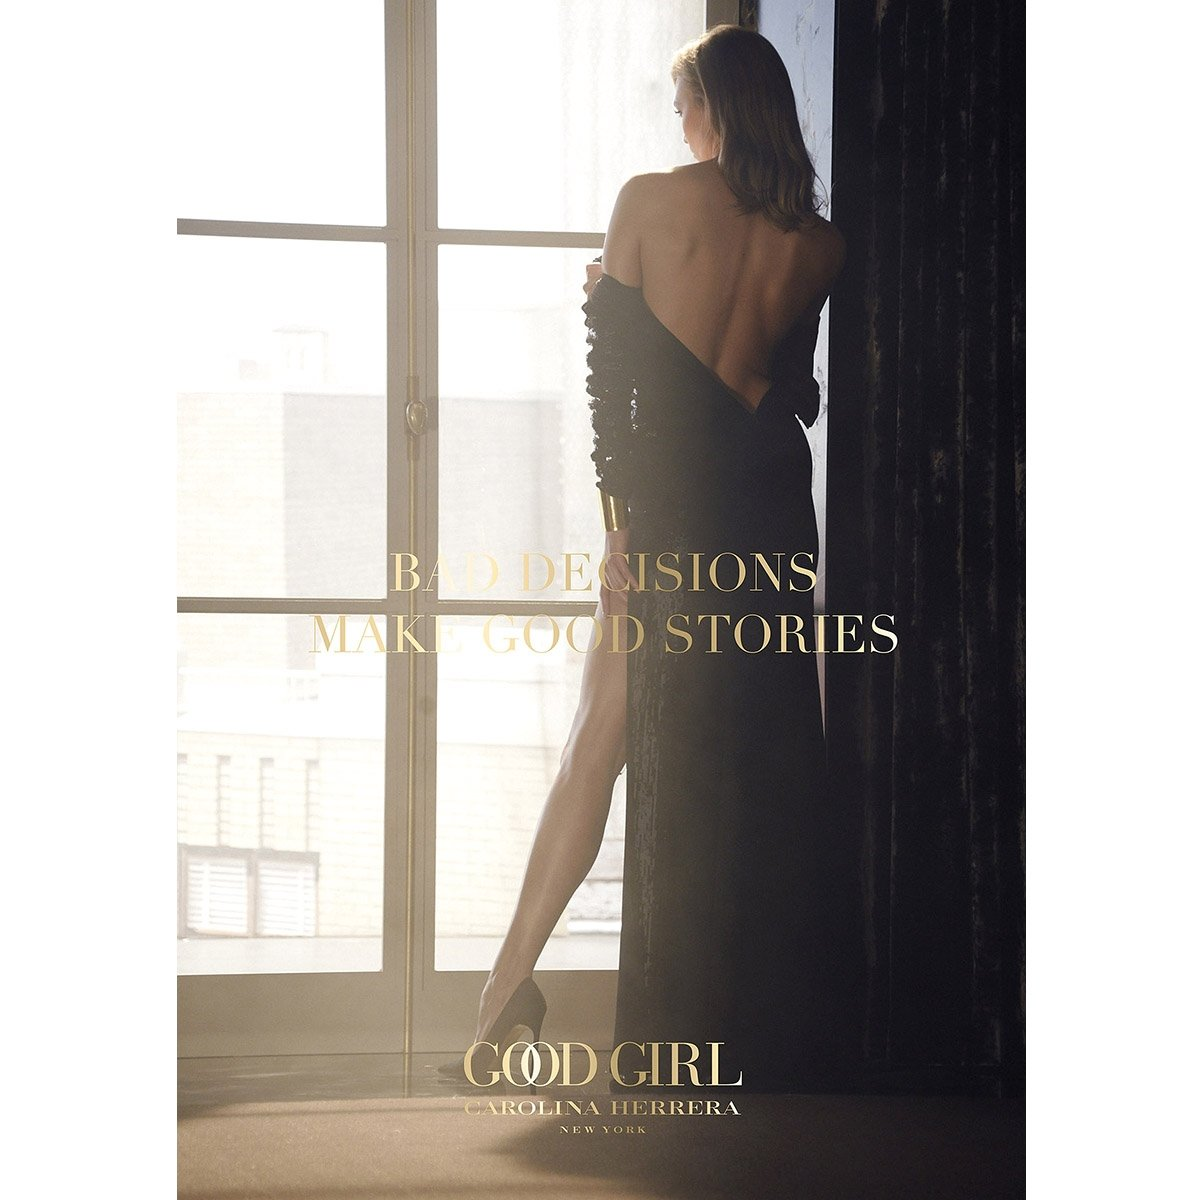 Perfume Feminino Good Girl Carolina Herrera Eau de Parfum 50ml - 4